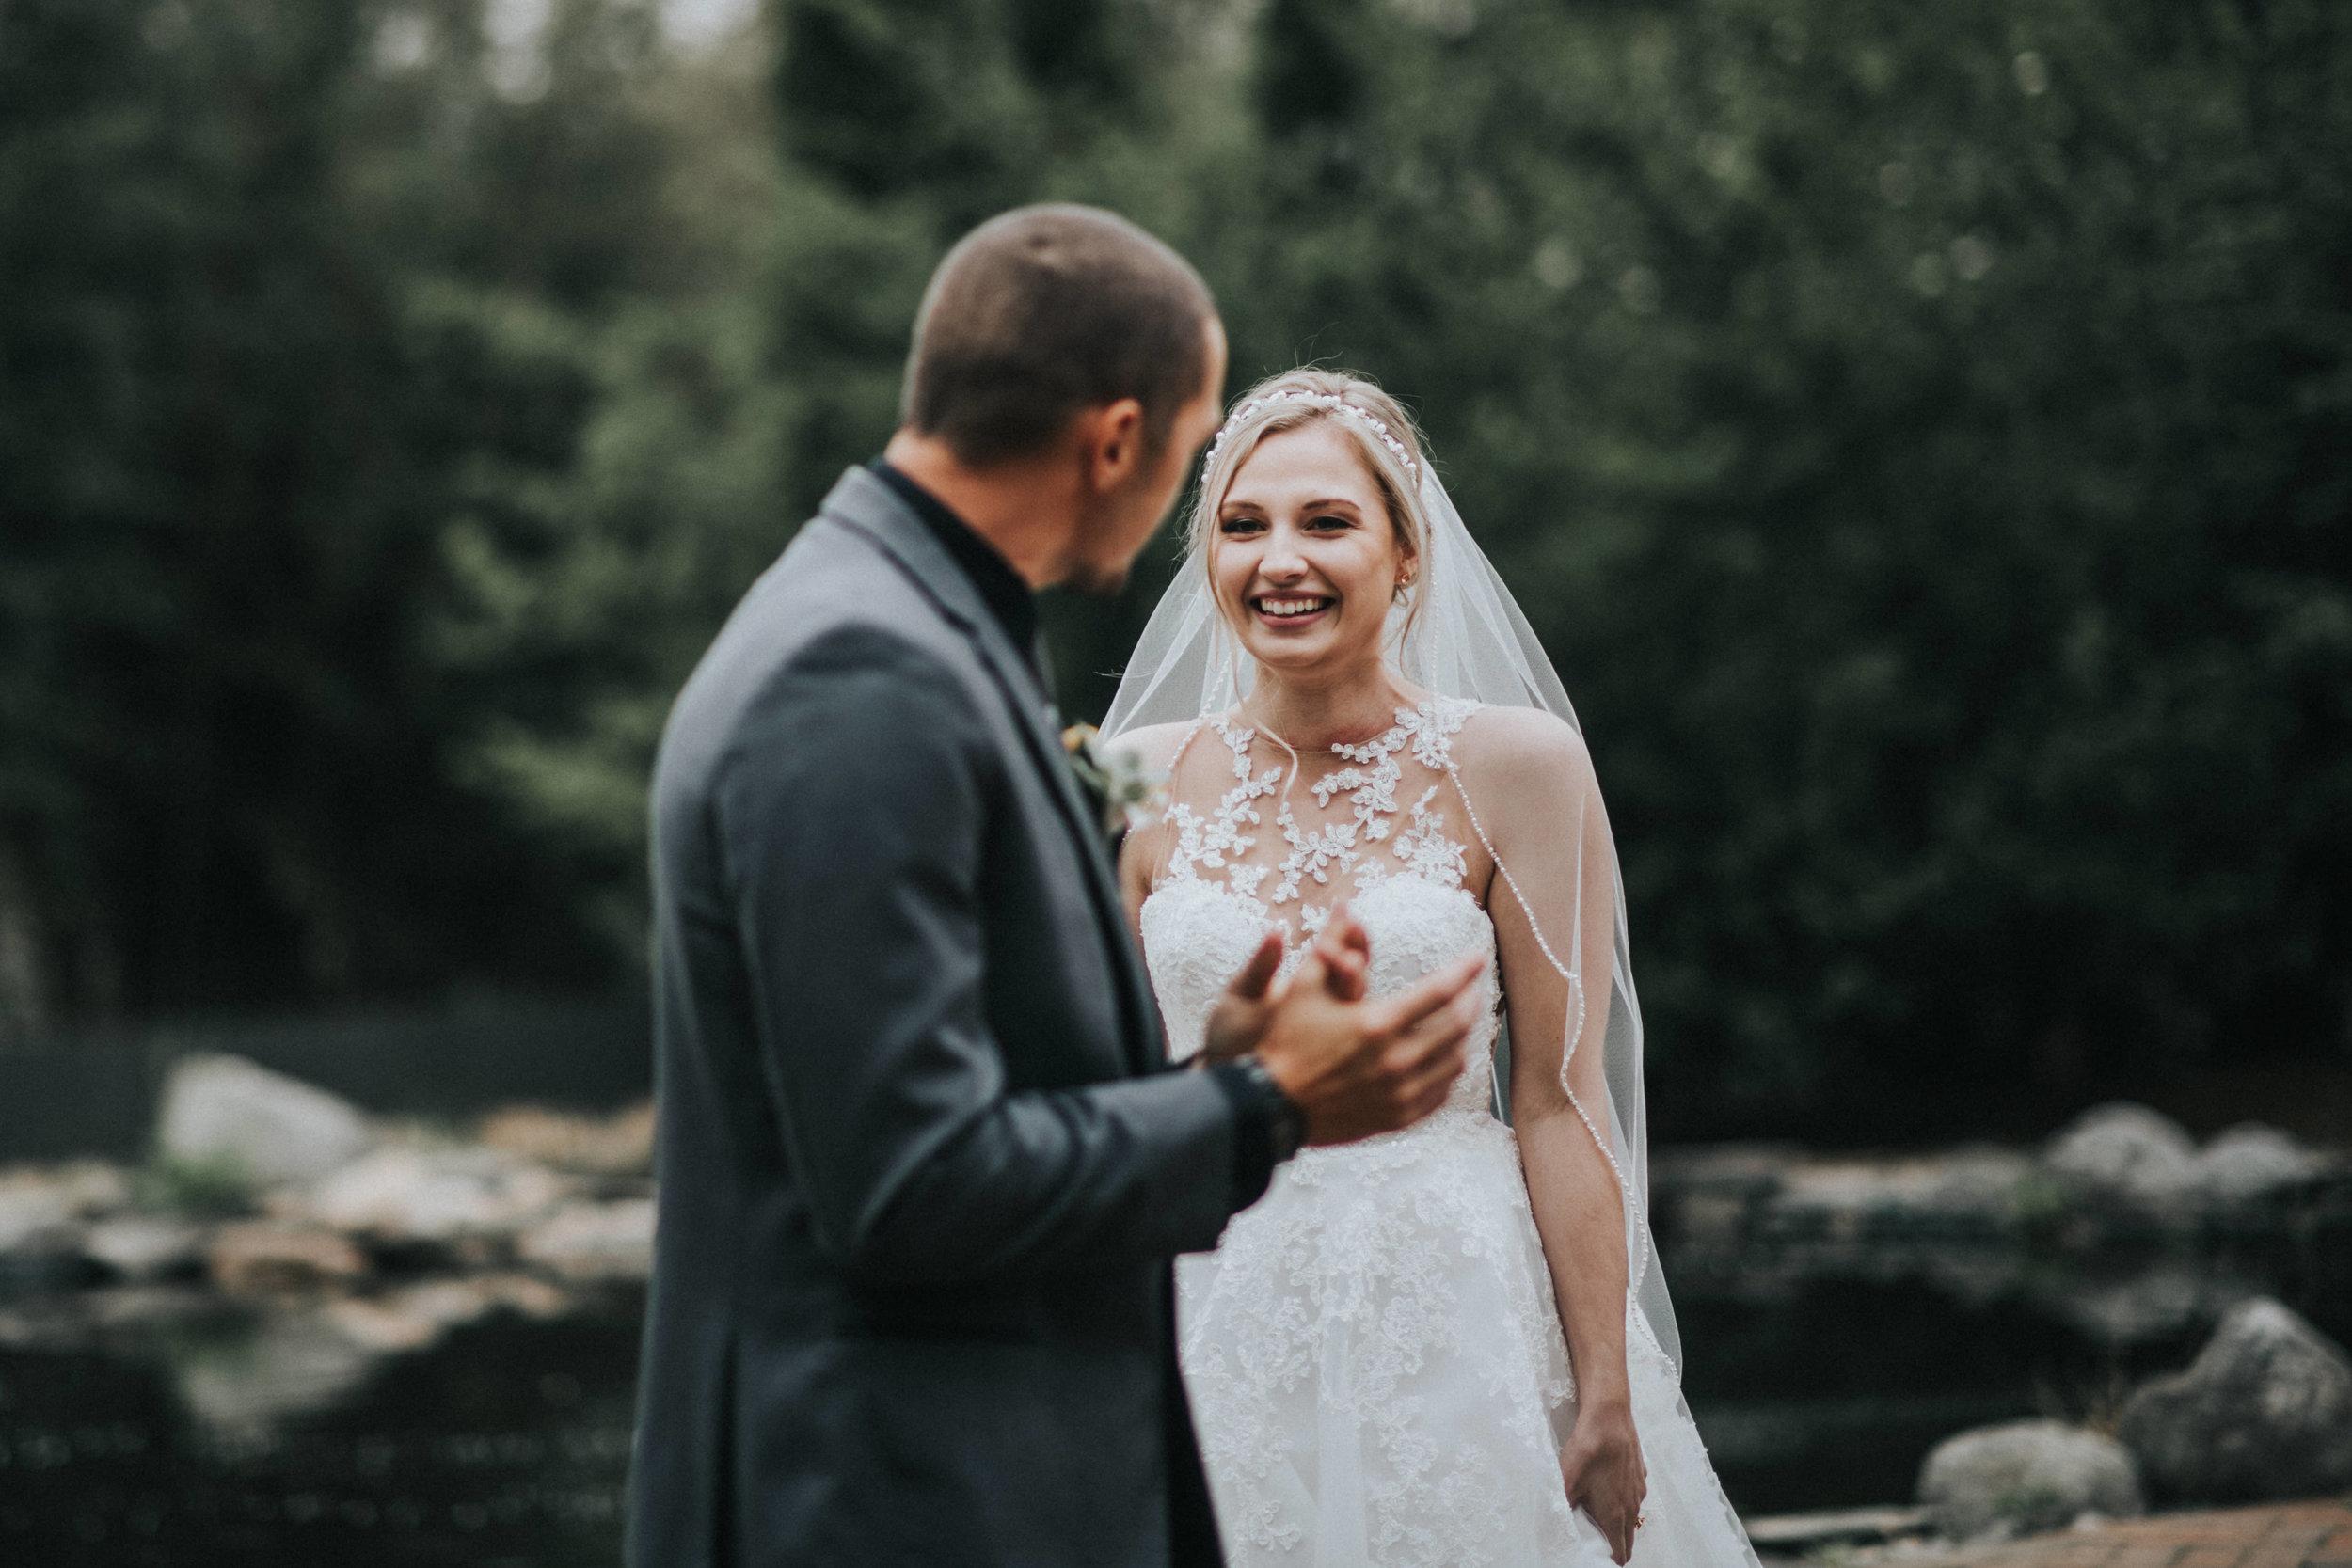 New-Jersey-Wedding-Photographer-Megan&Nick-FirstLooks-41.jpg